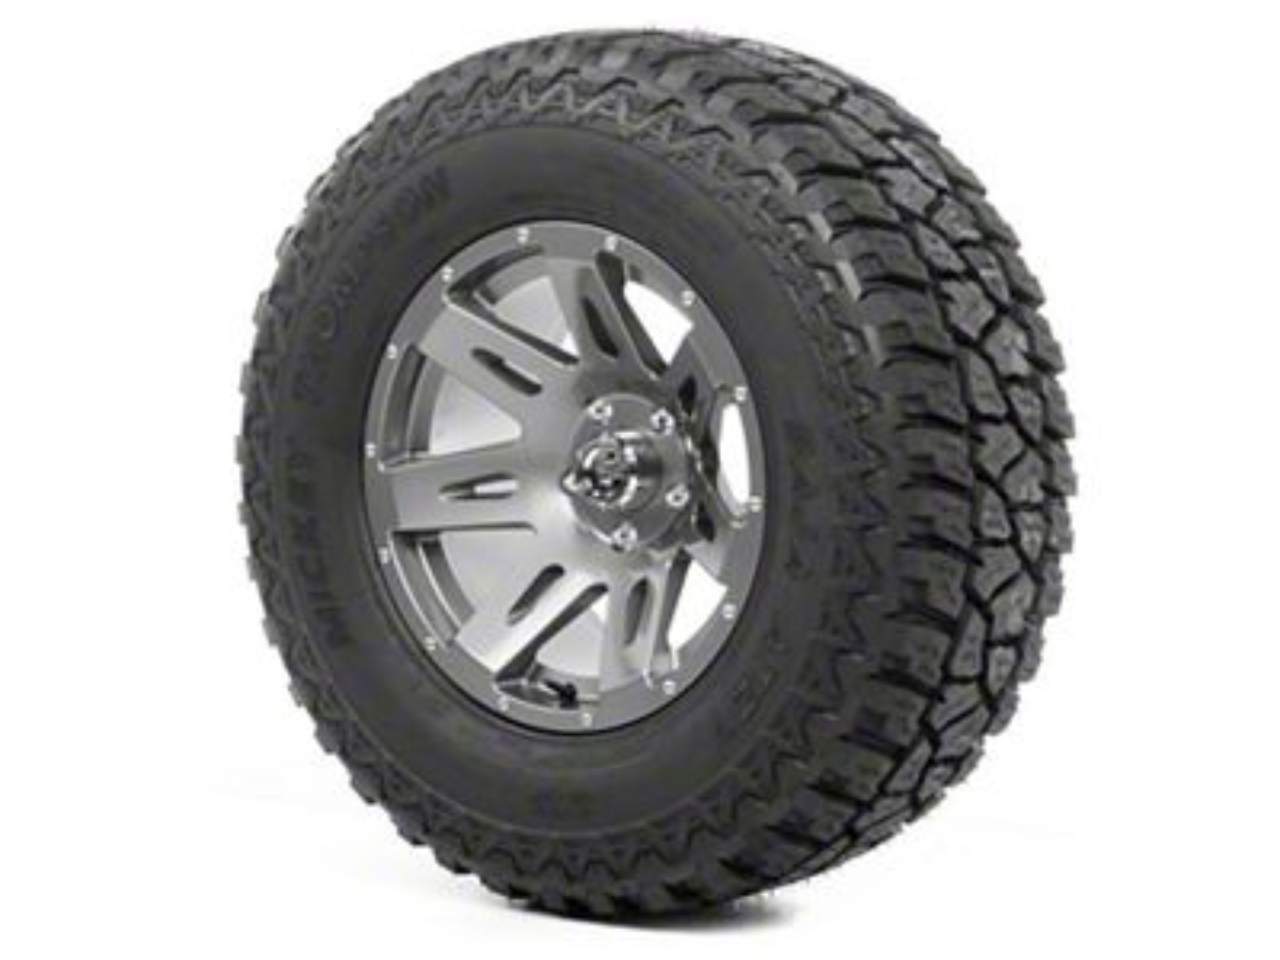 Rugged Ridge XHD Wheel 17x9 Gun Metal and Mickey Thompson ATZ P3 315/70R17 Tire (07-18 Jeep Wrangler JK)